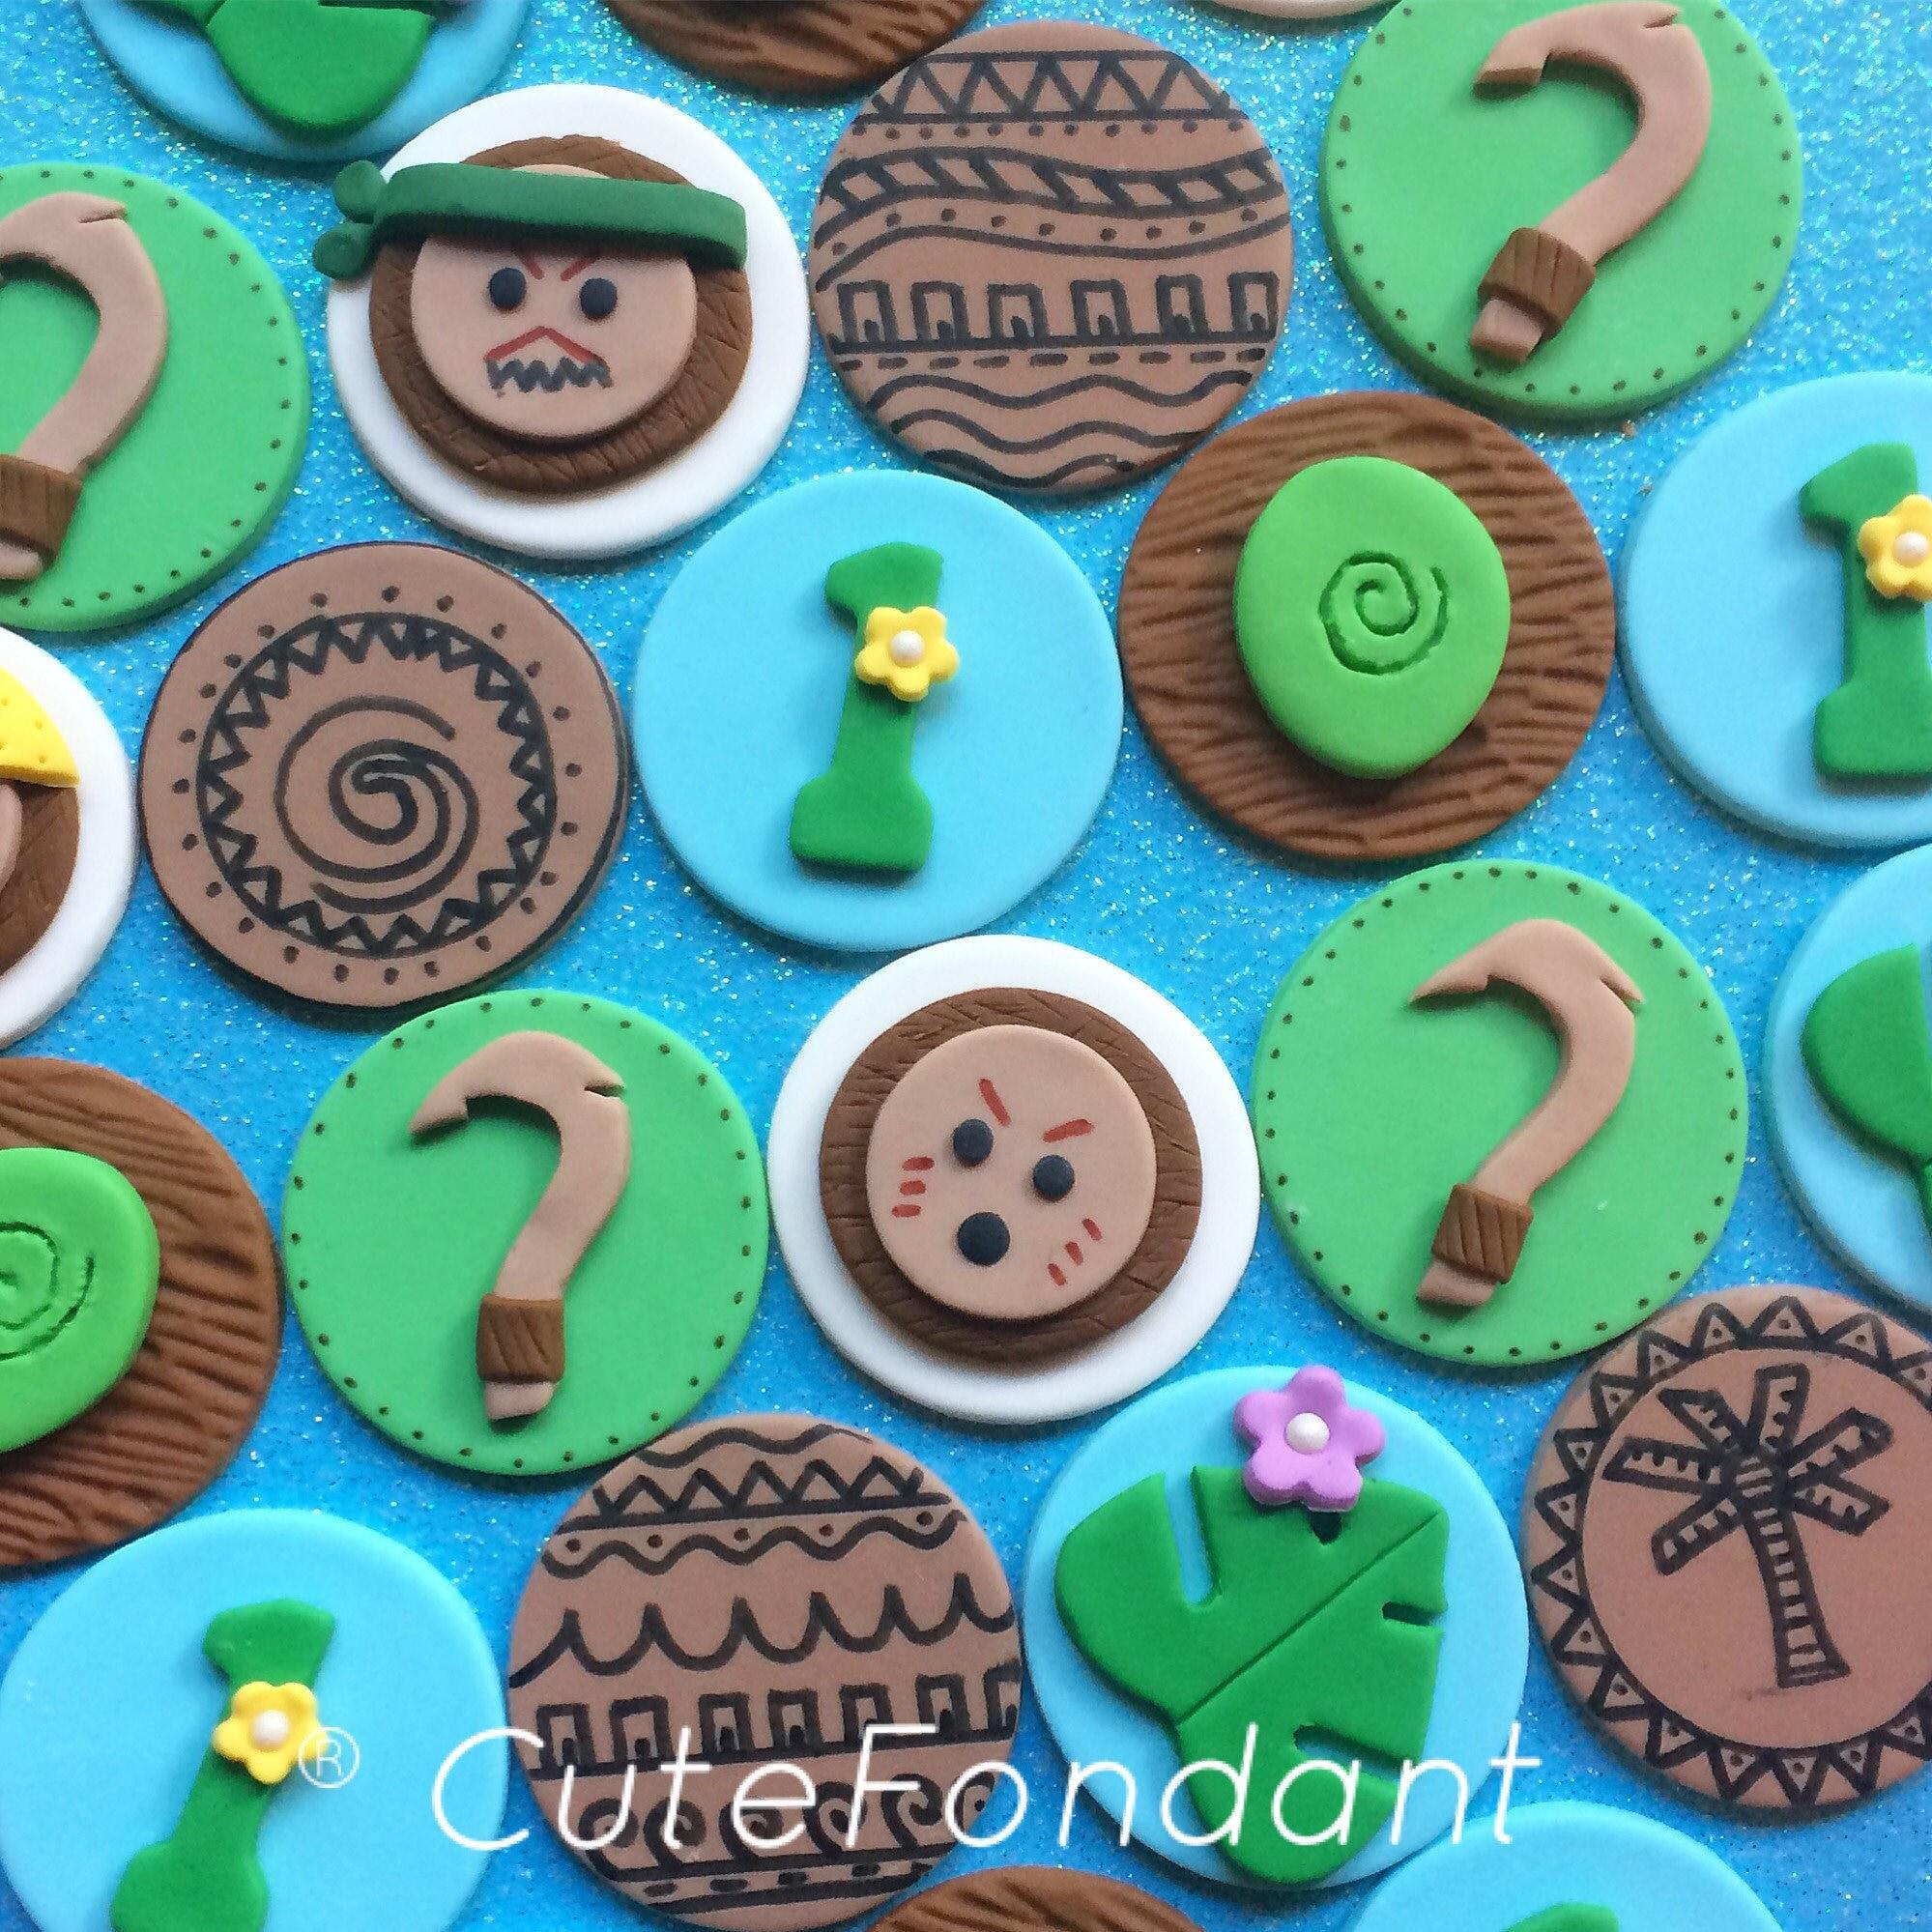 12 Maui Fondant Kuchen Topper Maui Haken Moana Partei